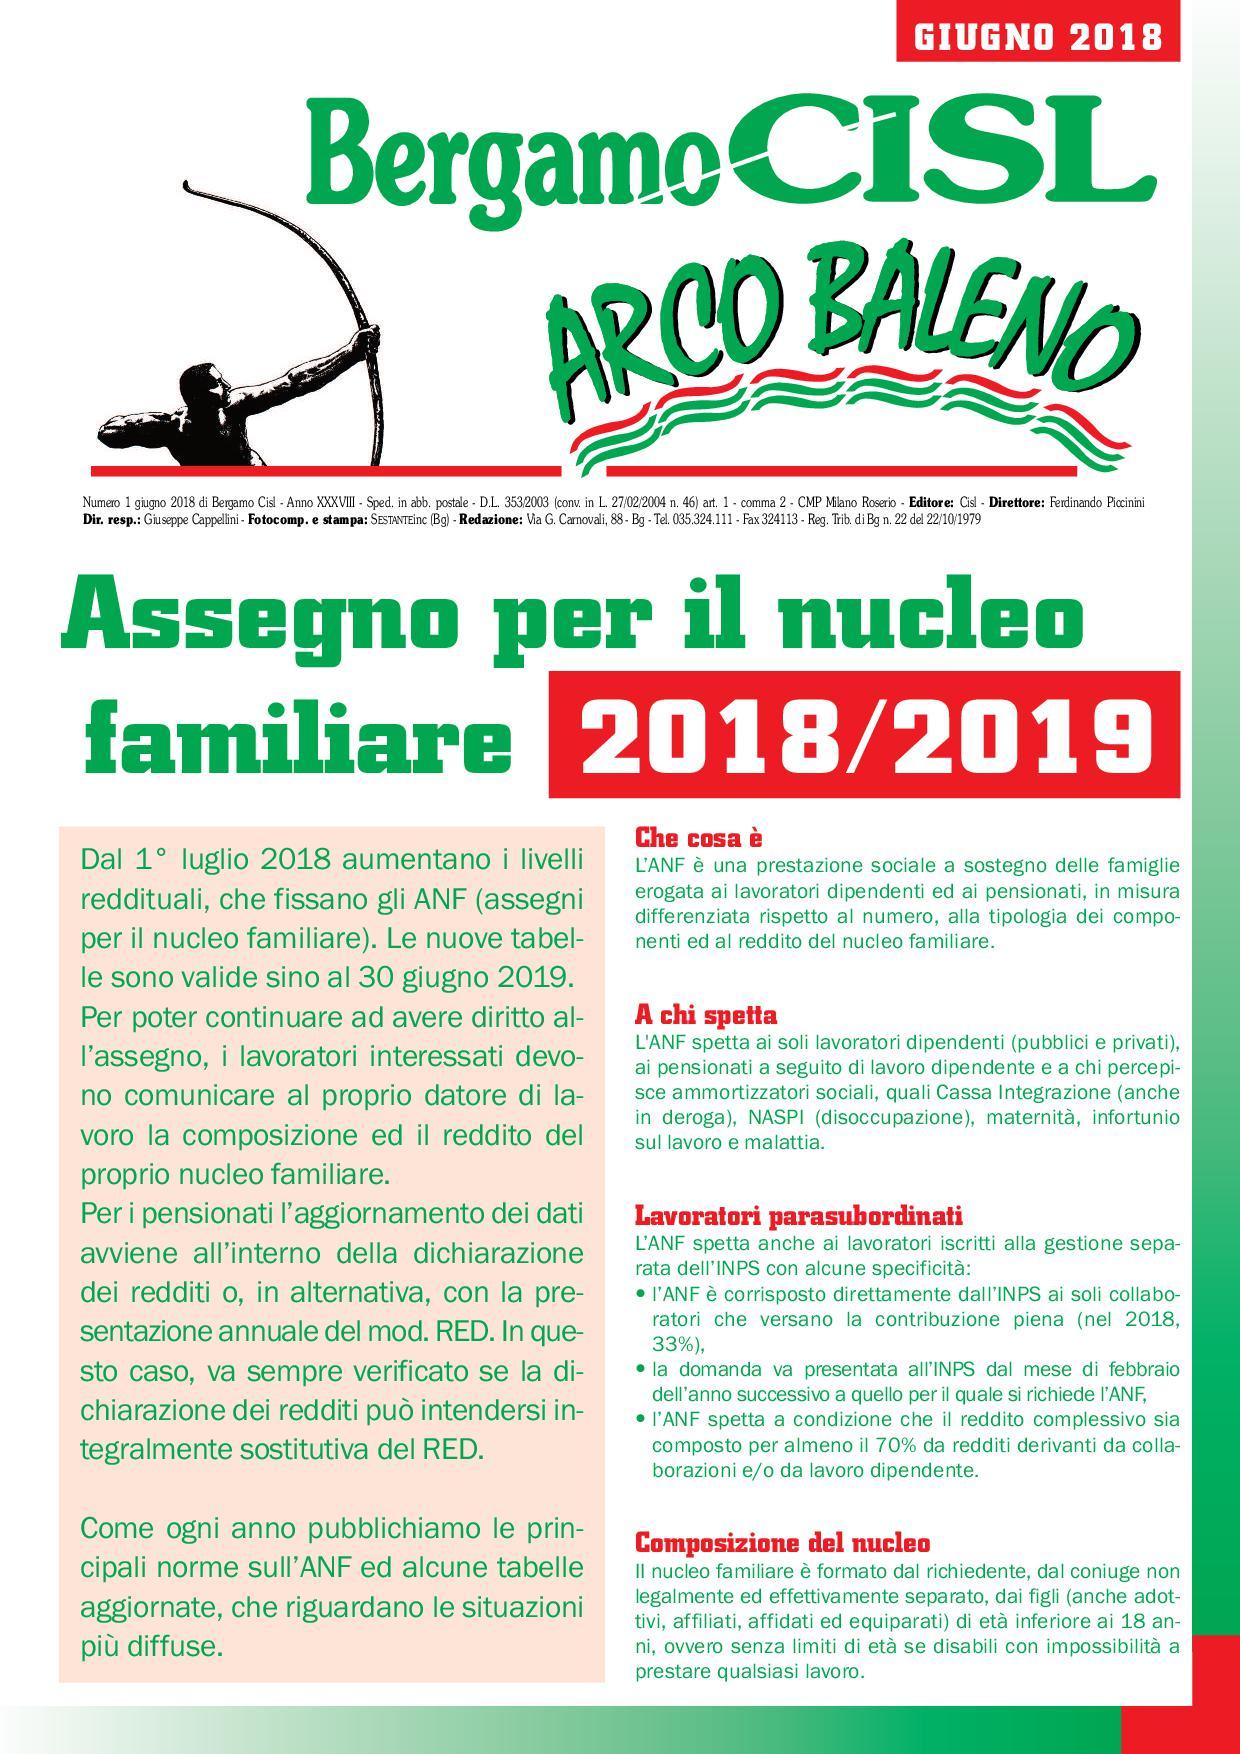 CISL Arcobaleno 2018 Giugno « FP CISL LOMBARDIA